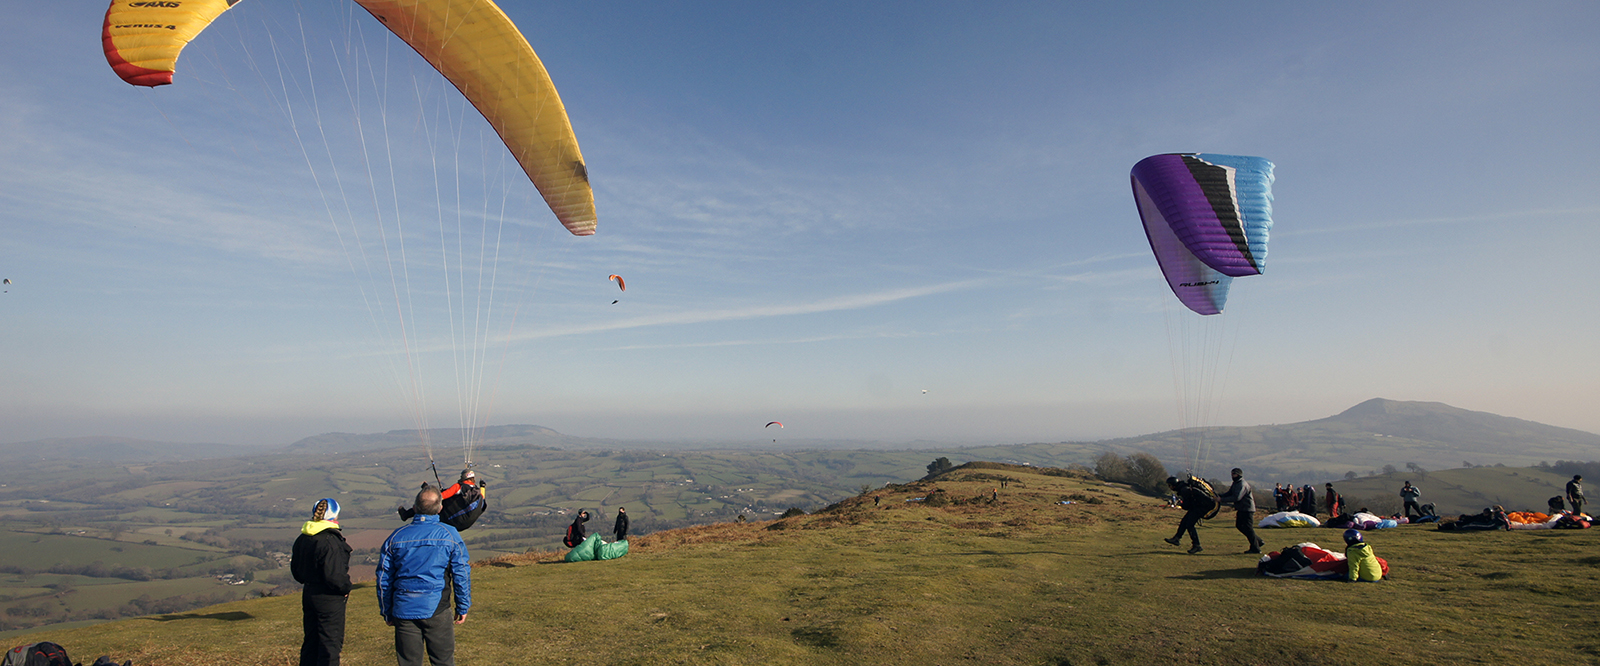 Kieran Rae Offa Offas Dyke Wales Hang Gliding